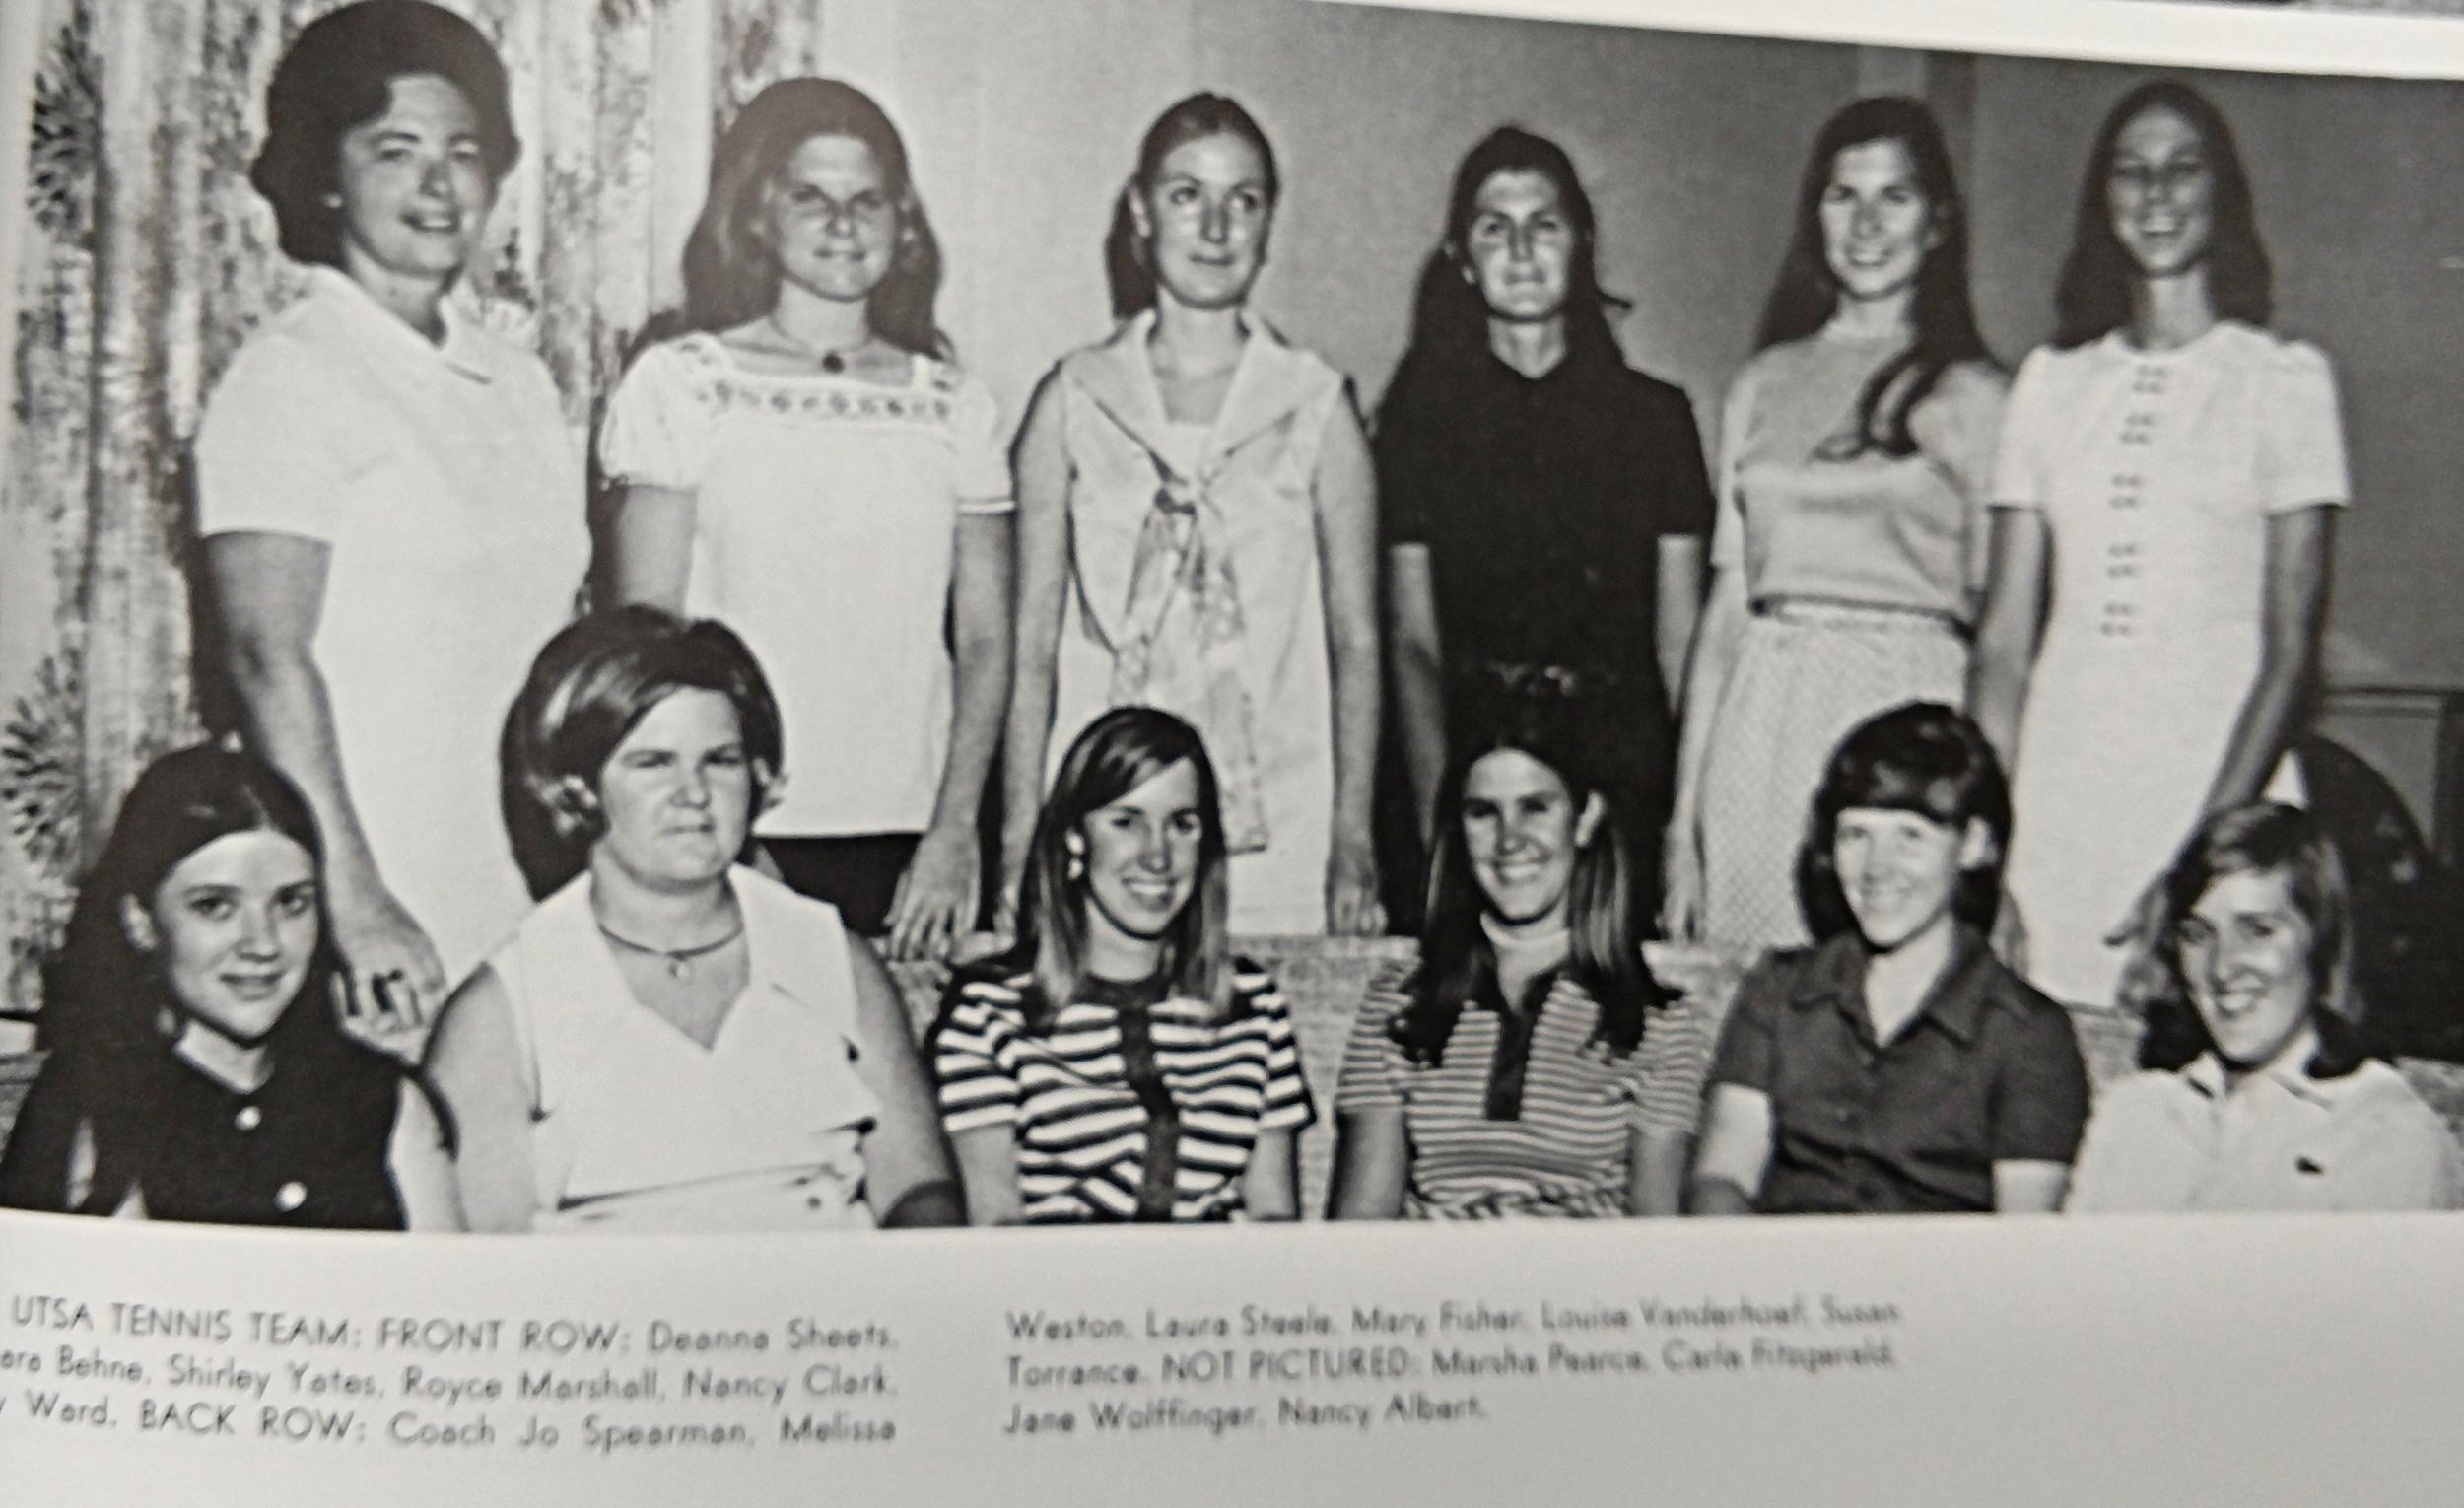 1971 Tennis team Coach Jo Spearman